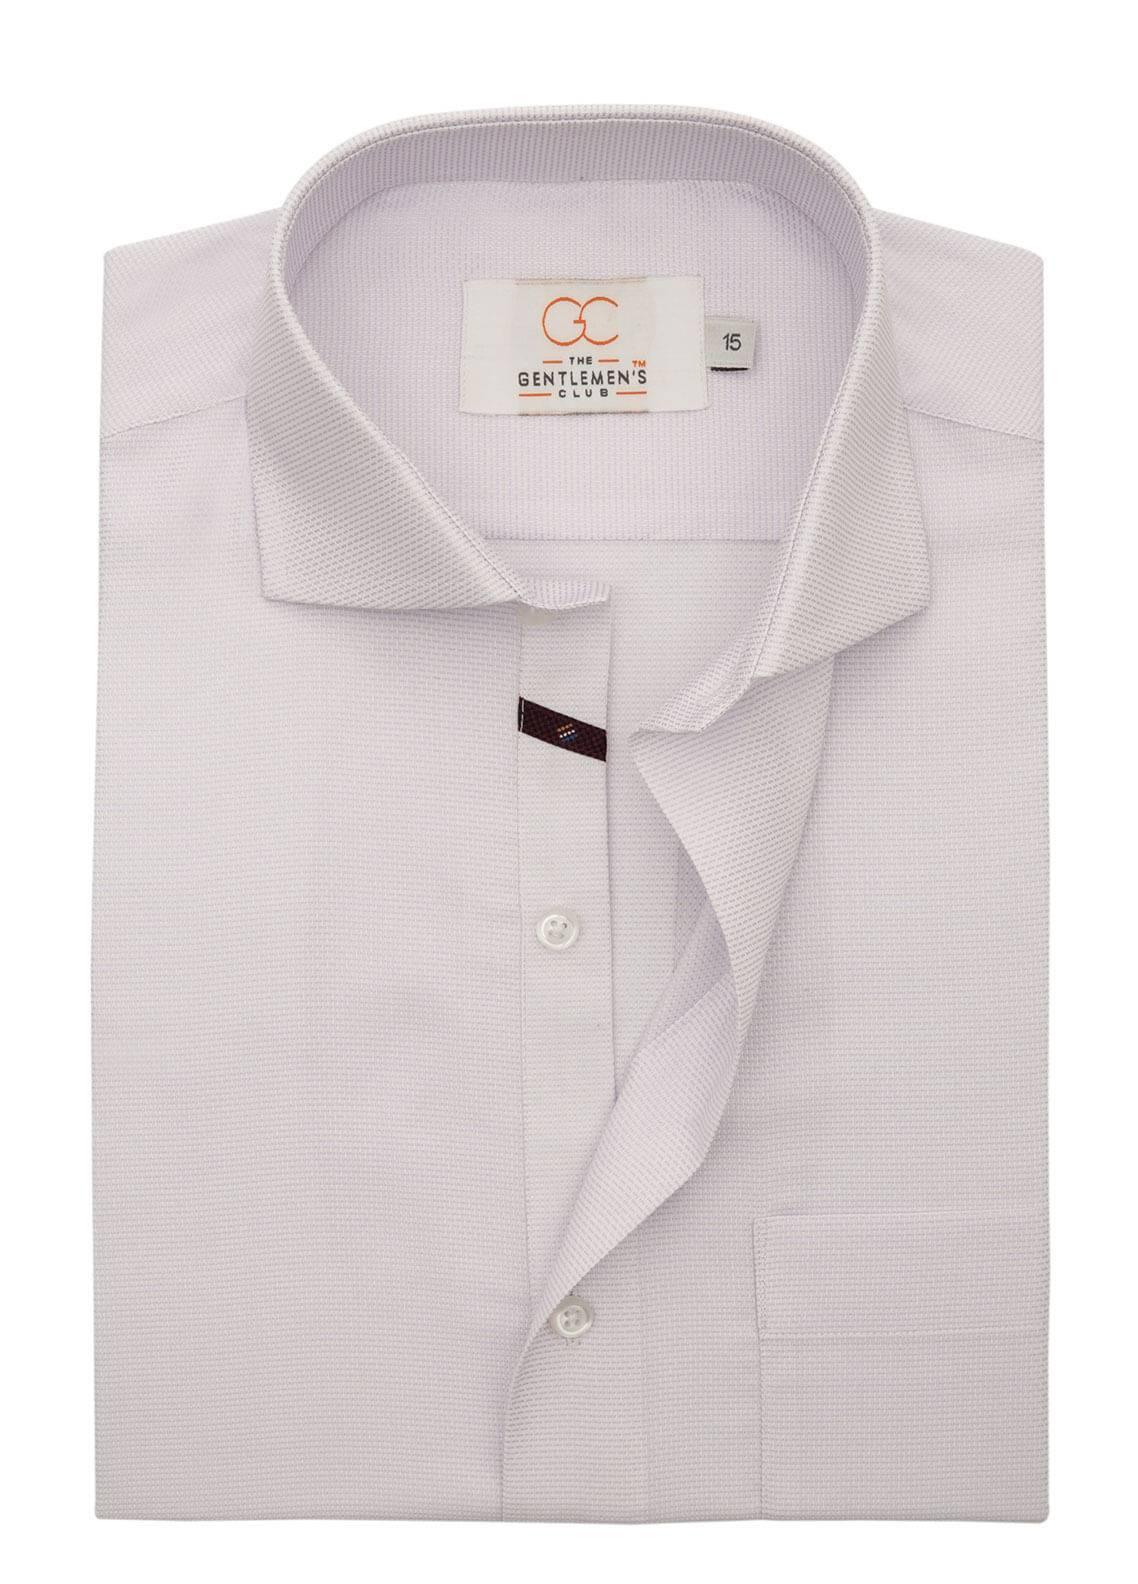 The Gentlemen's Club Cotton Formal Shirts for Men - Light Purple White Label 4078 - 18.5